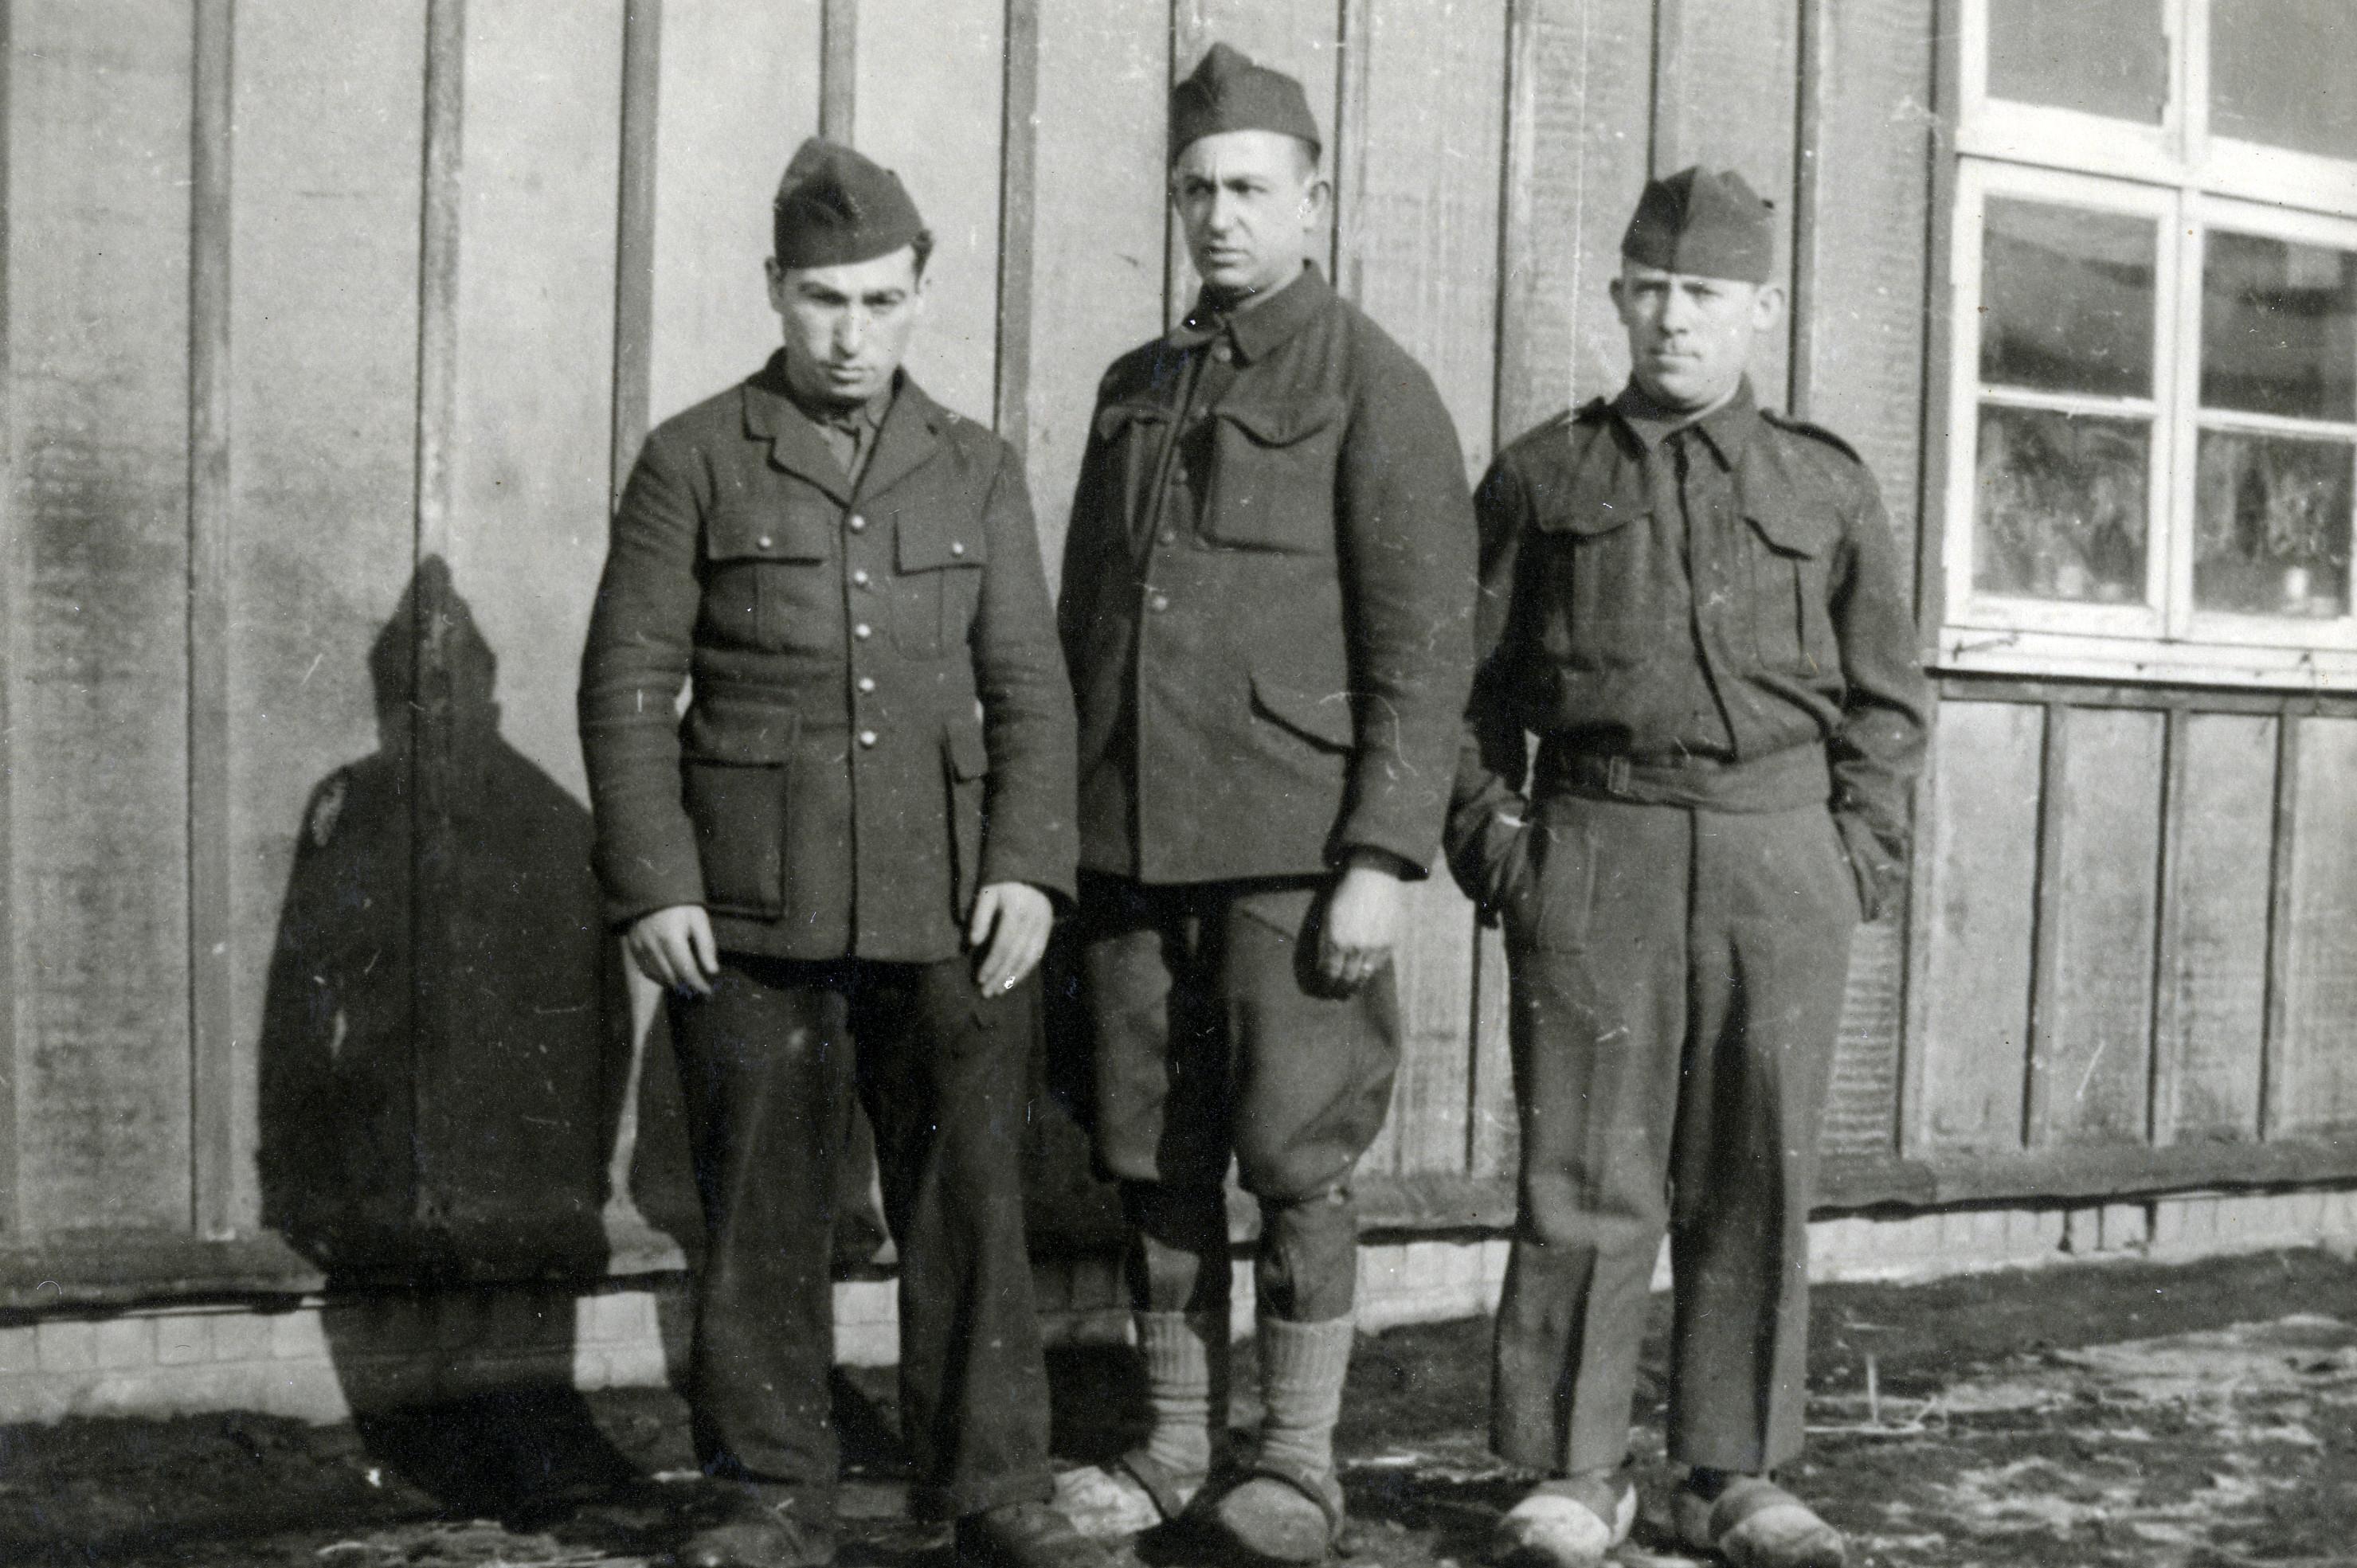 Yaakov Jean Ridnik (center) with two fellow prisoners in a German prisoner of war camp.